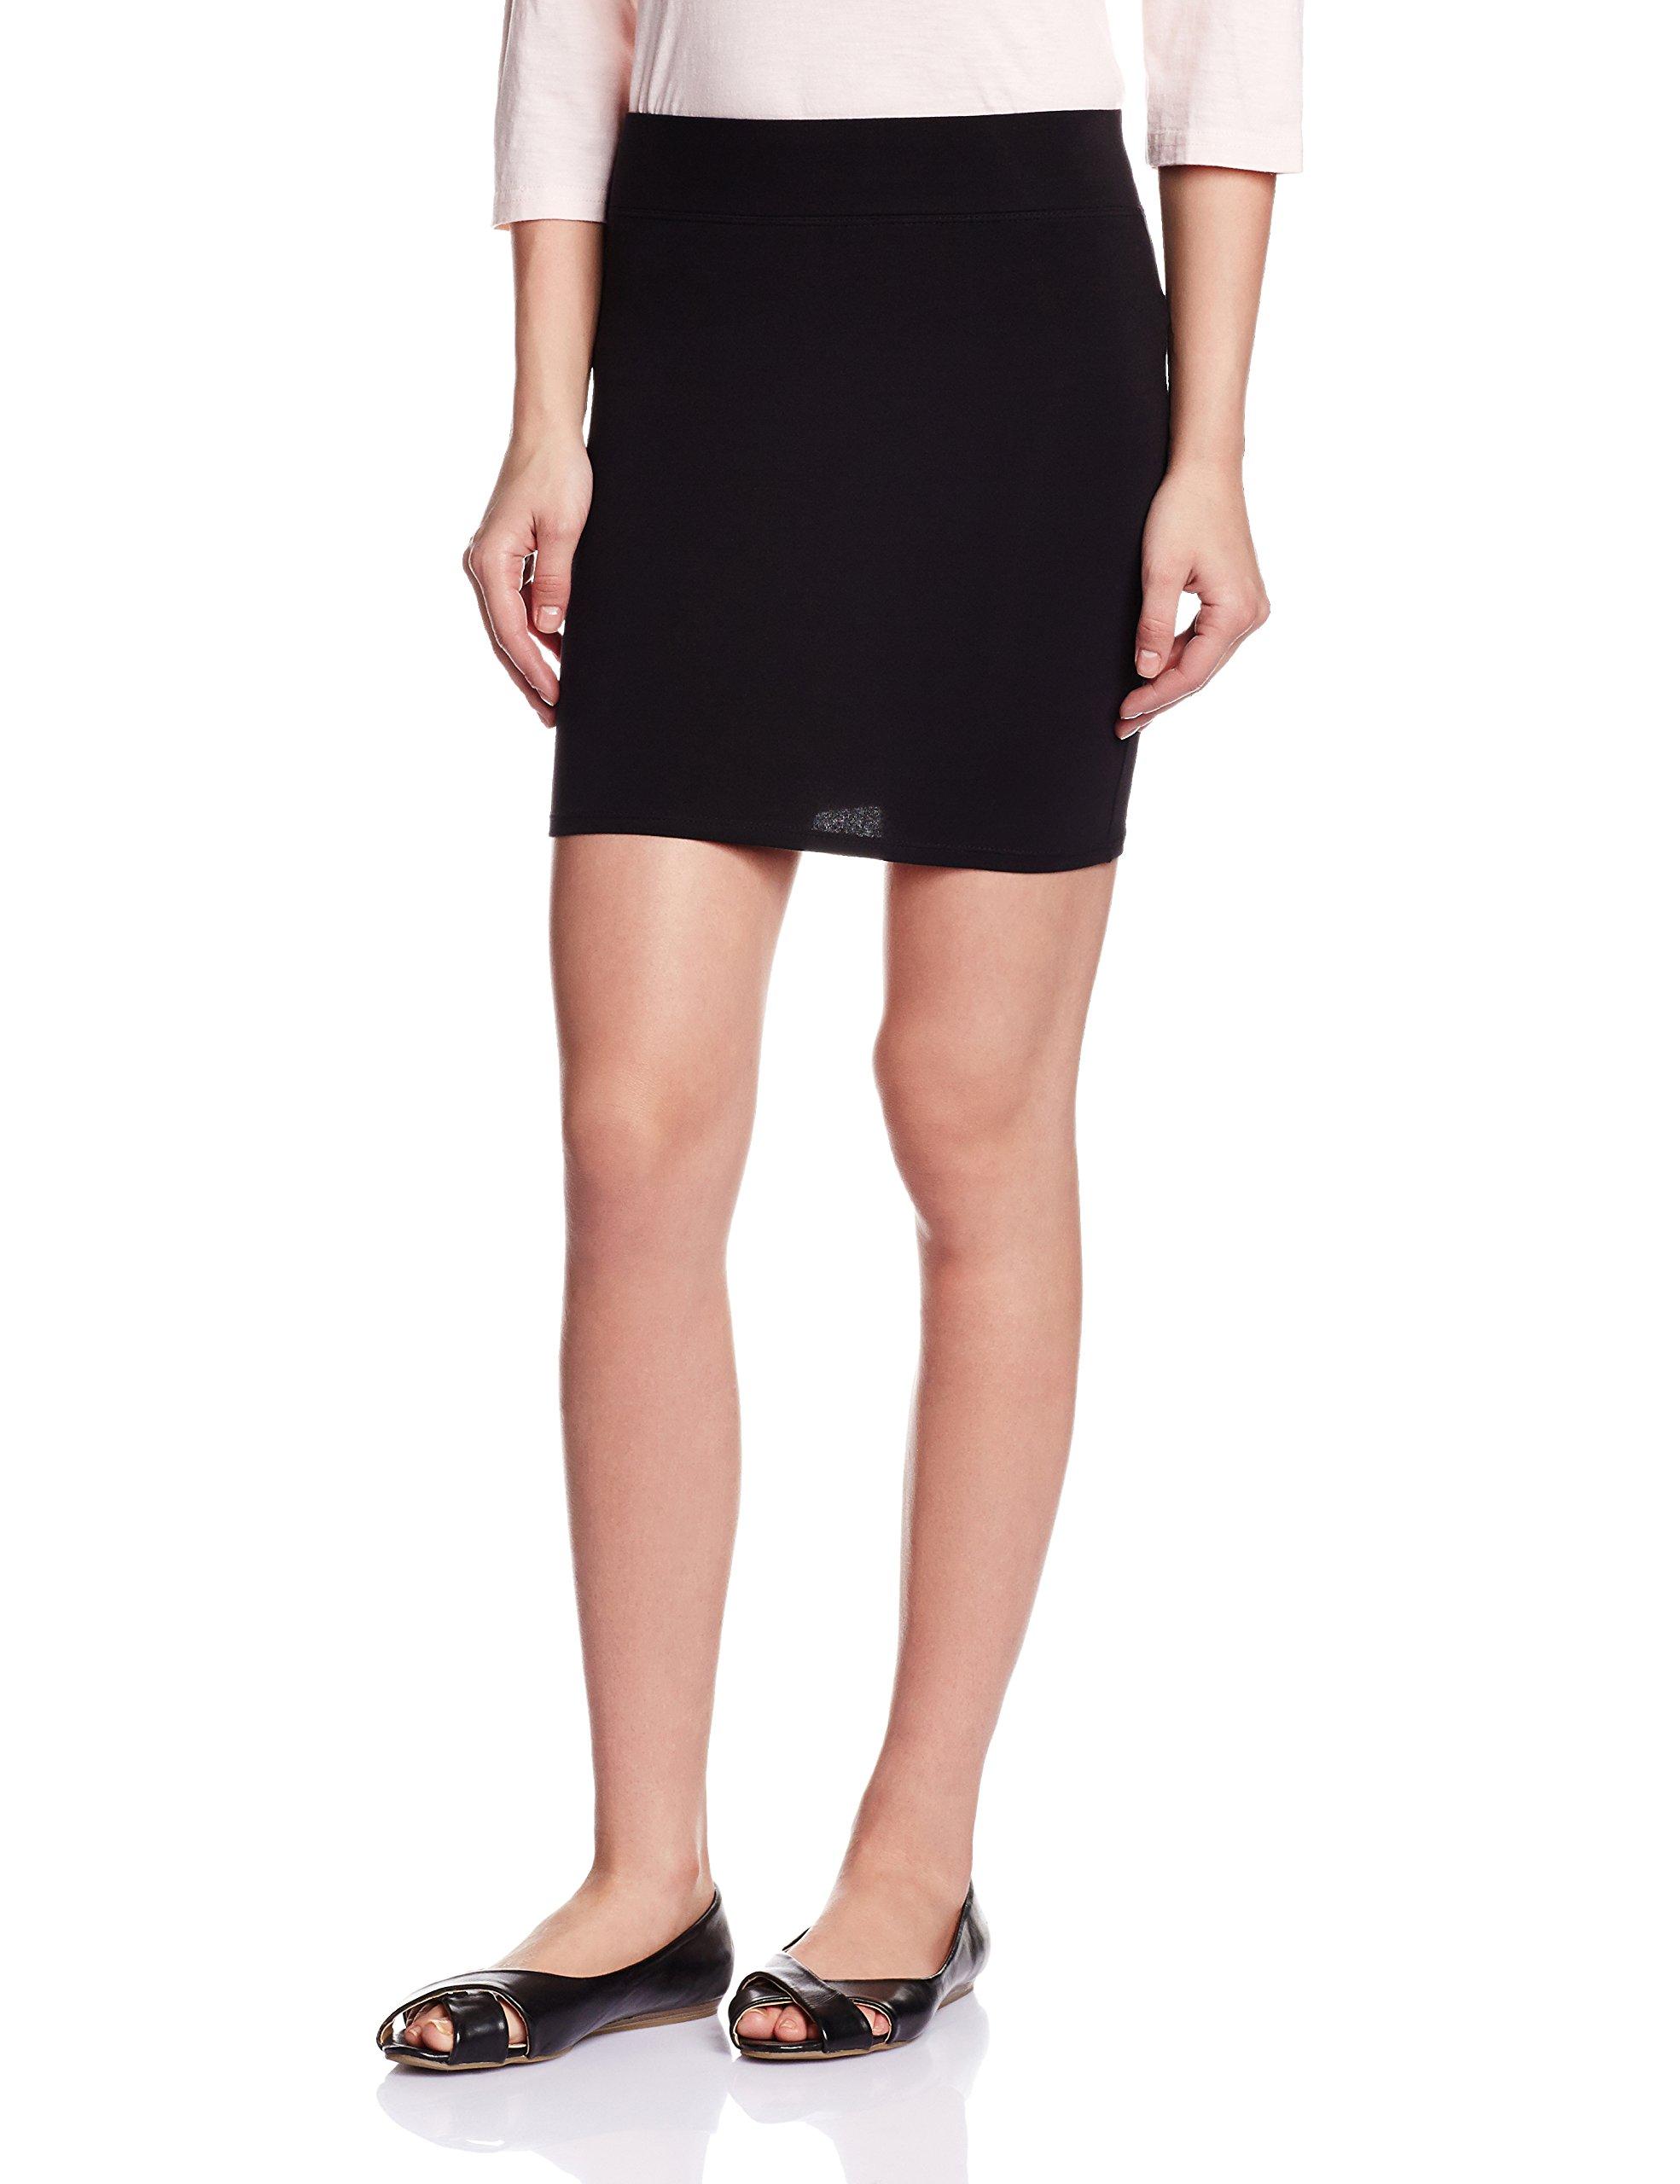 Rattrap Women's Skirt (COREFITFBLK_Black_S)